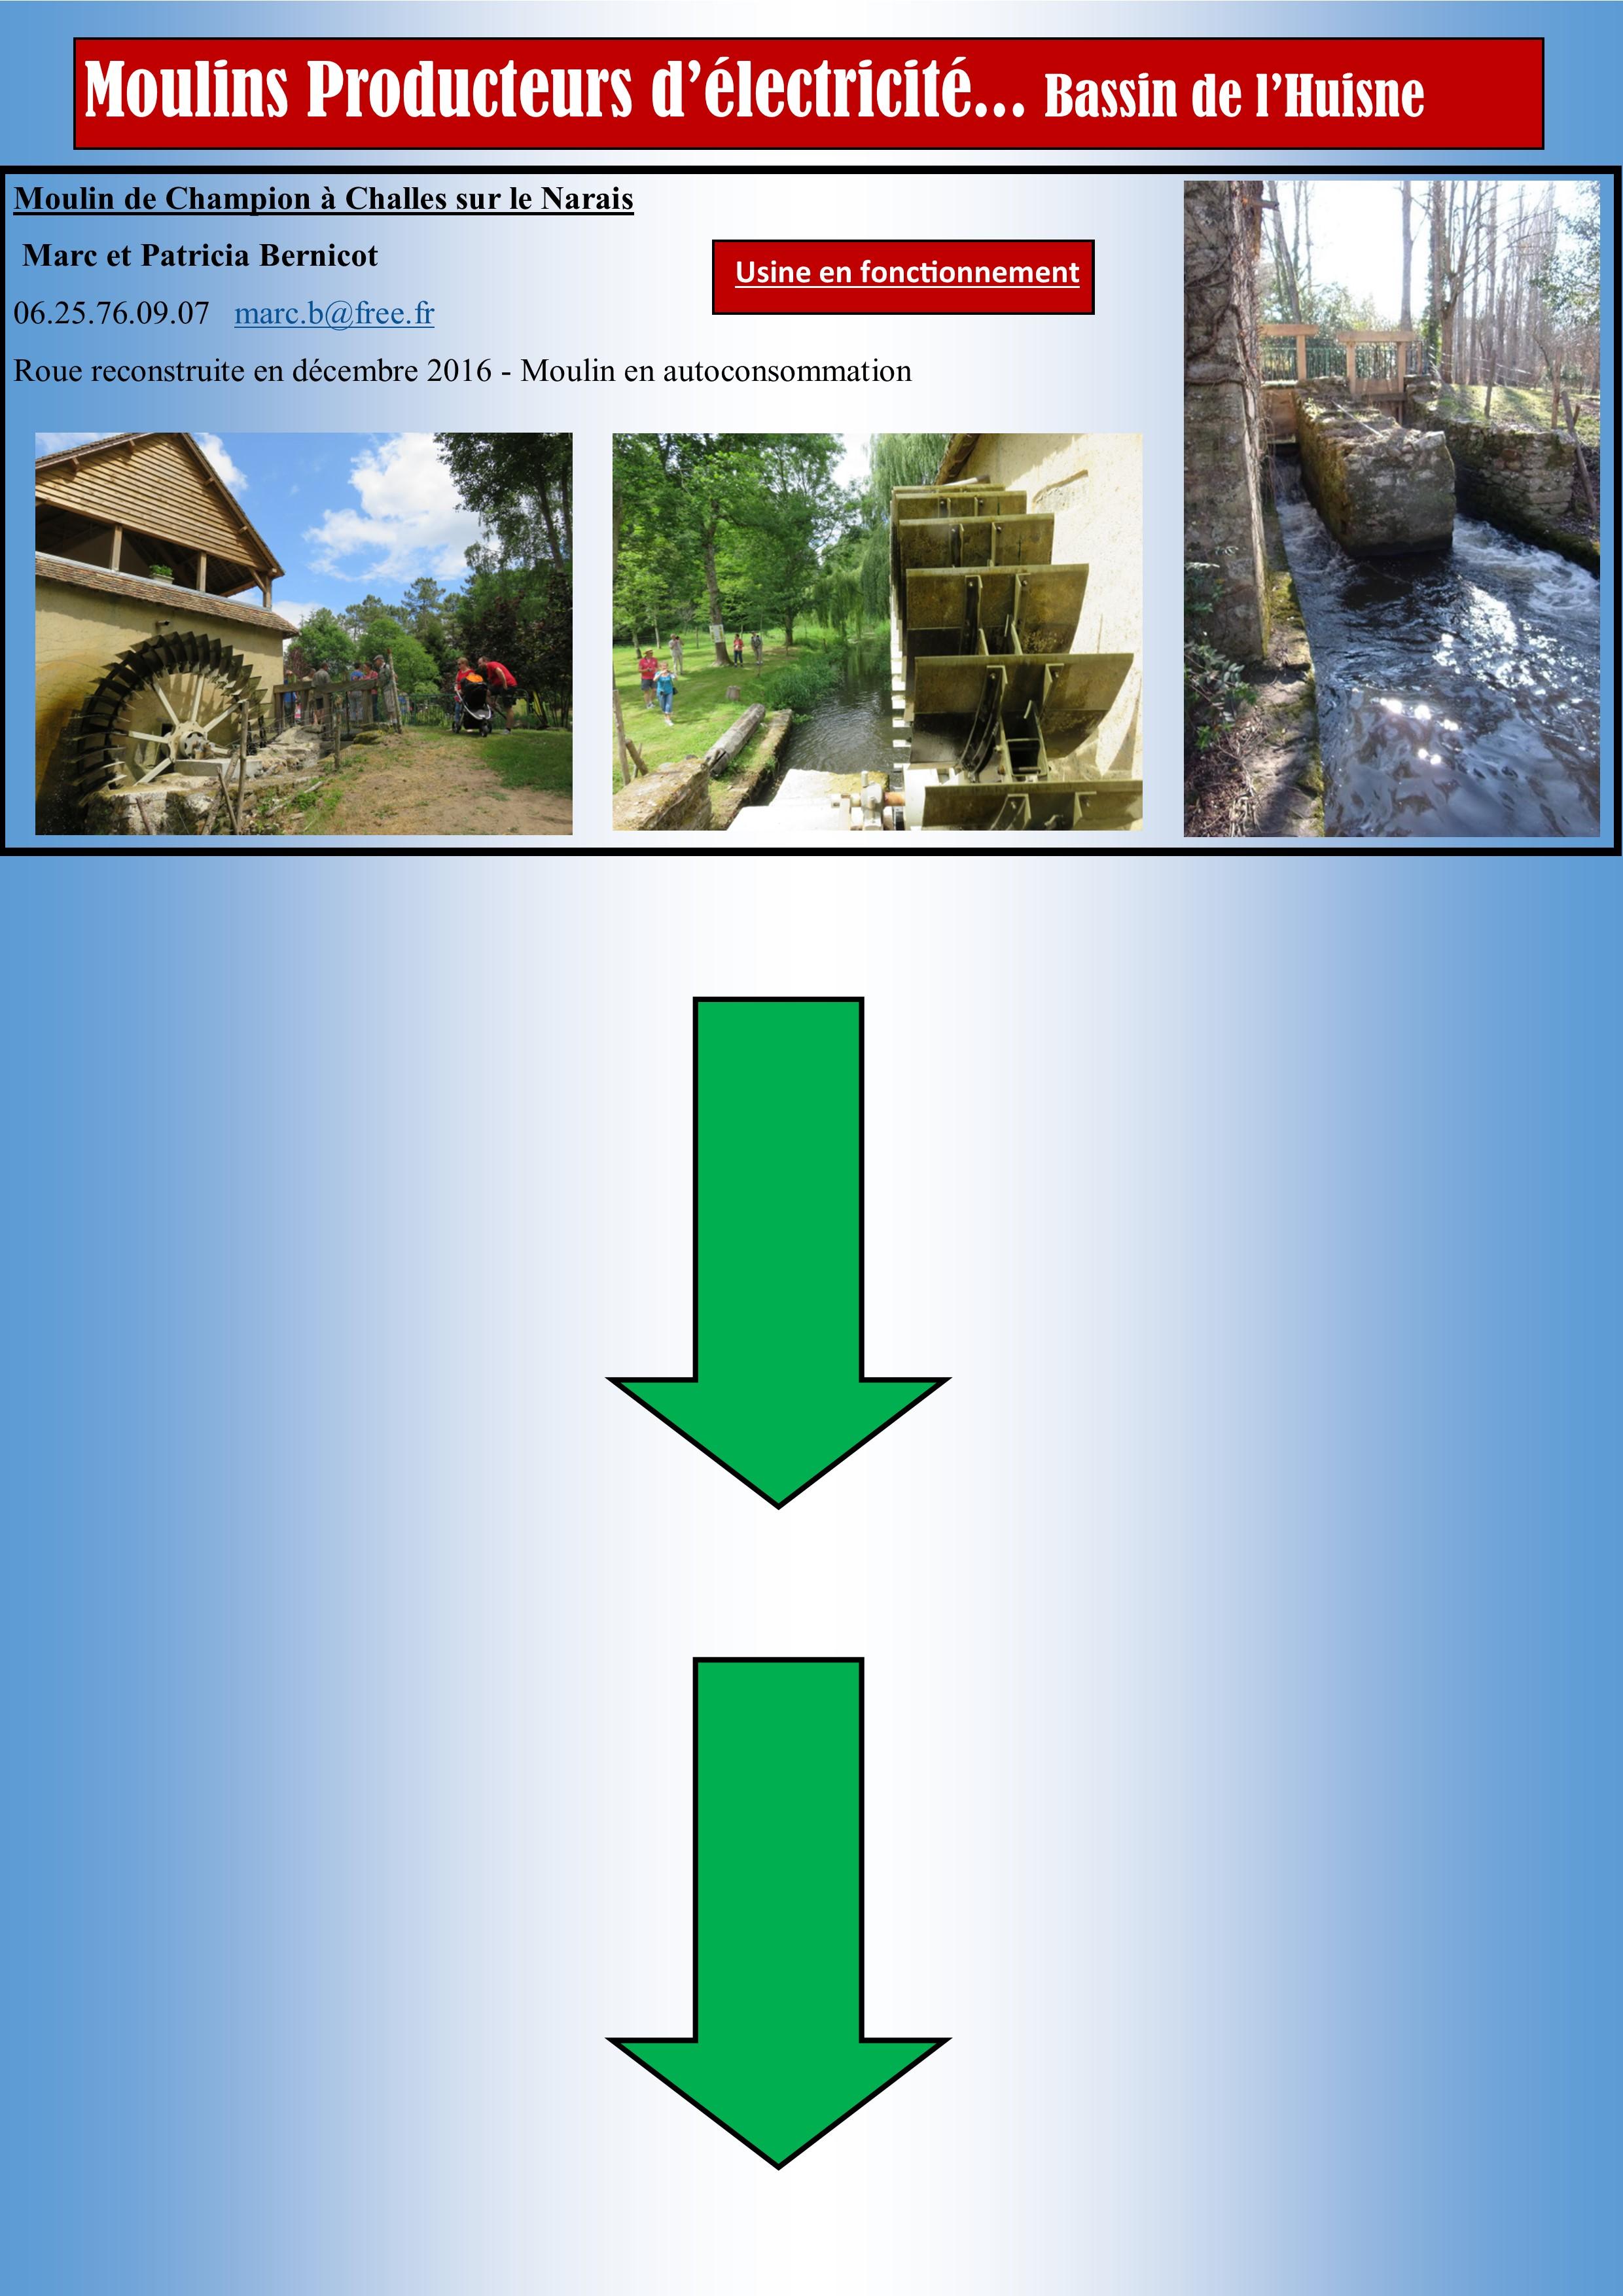 Hydroélectricité Huisne 2